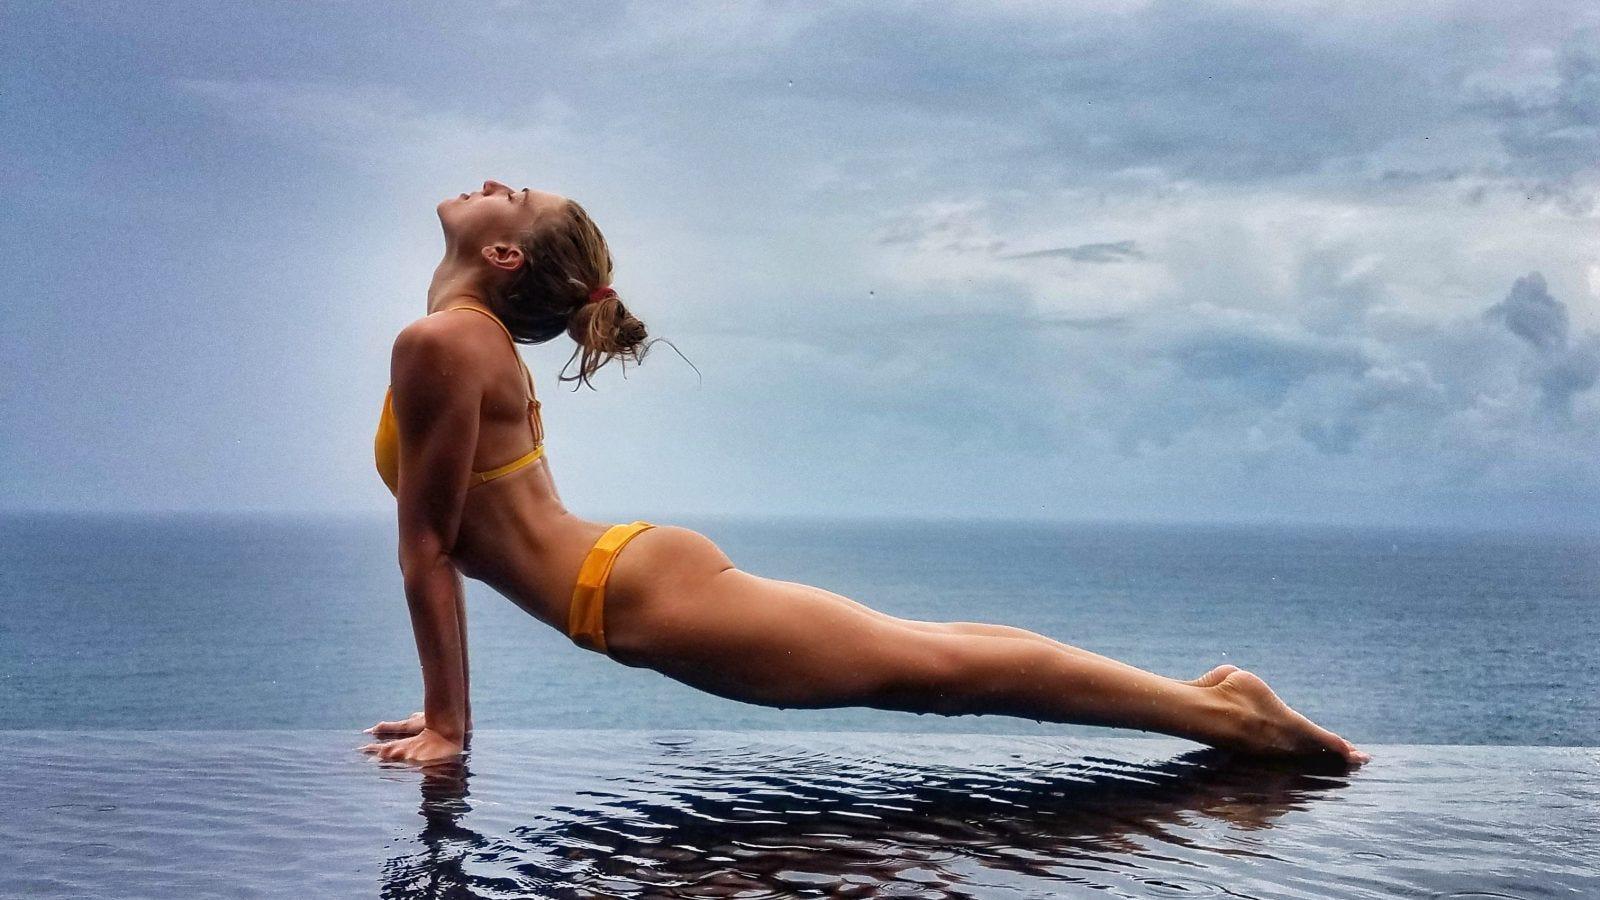 Woman doing upward facing dog yoga pose on the edge of an infinity pool